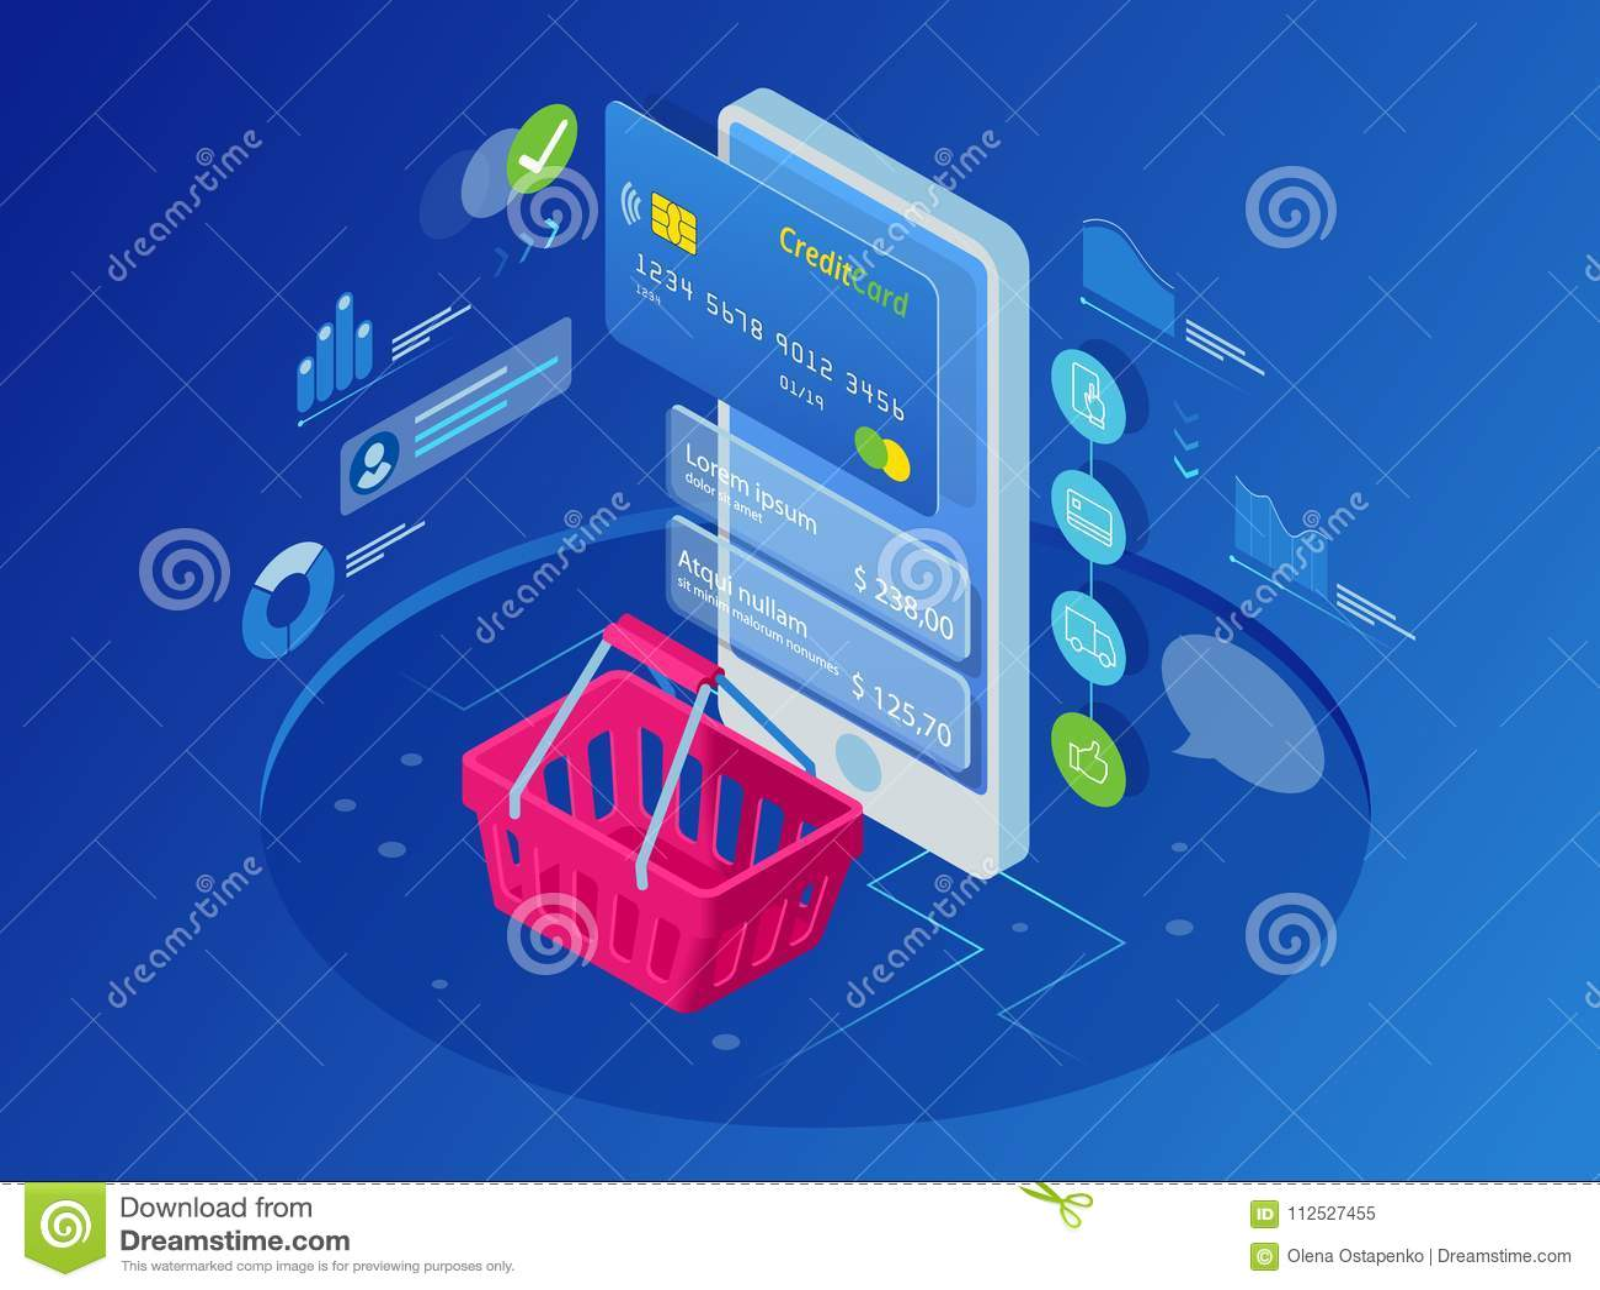 e124ef29827 Isometric Smart Phone Online Shopping Concept. Stock Vector ...